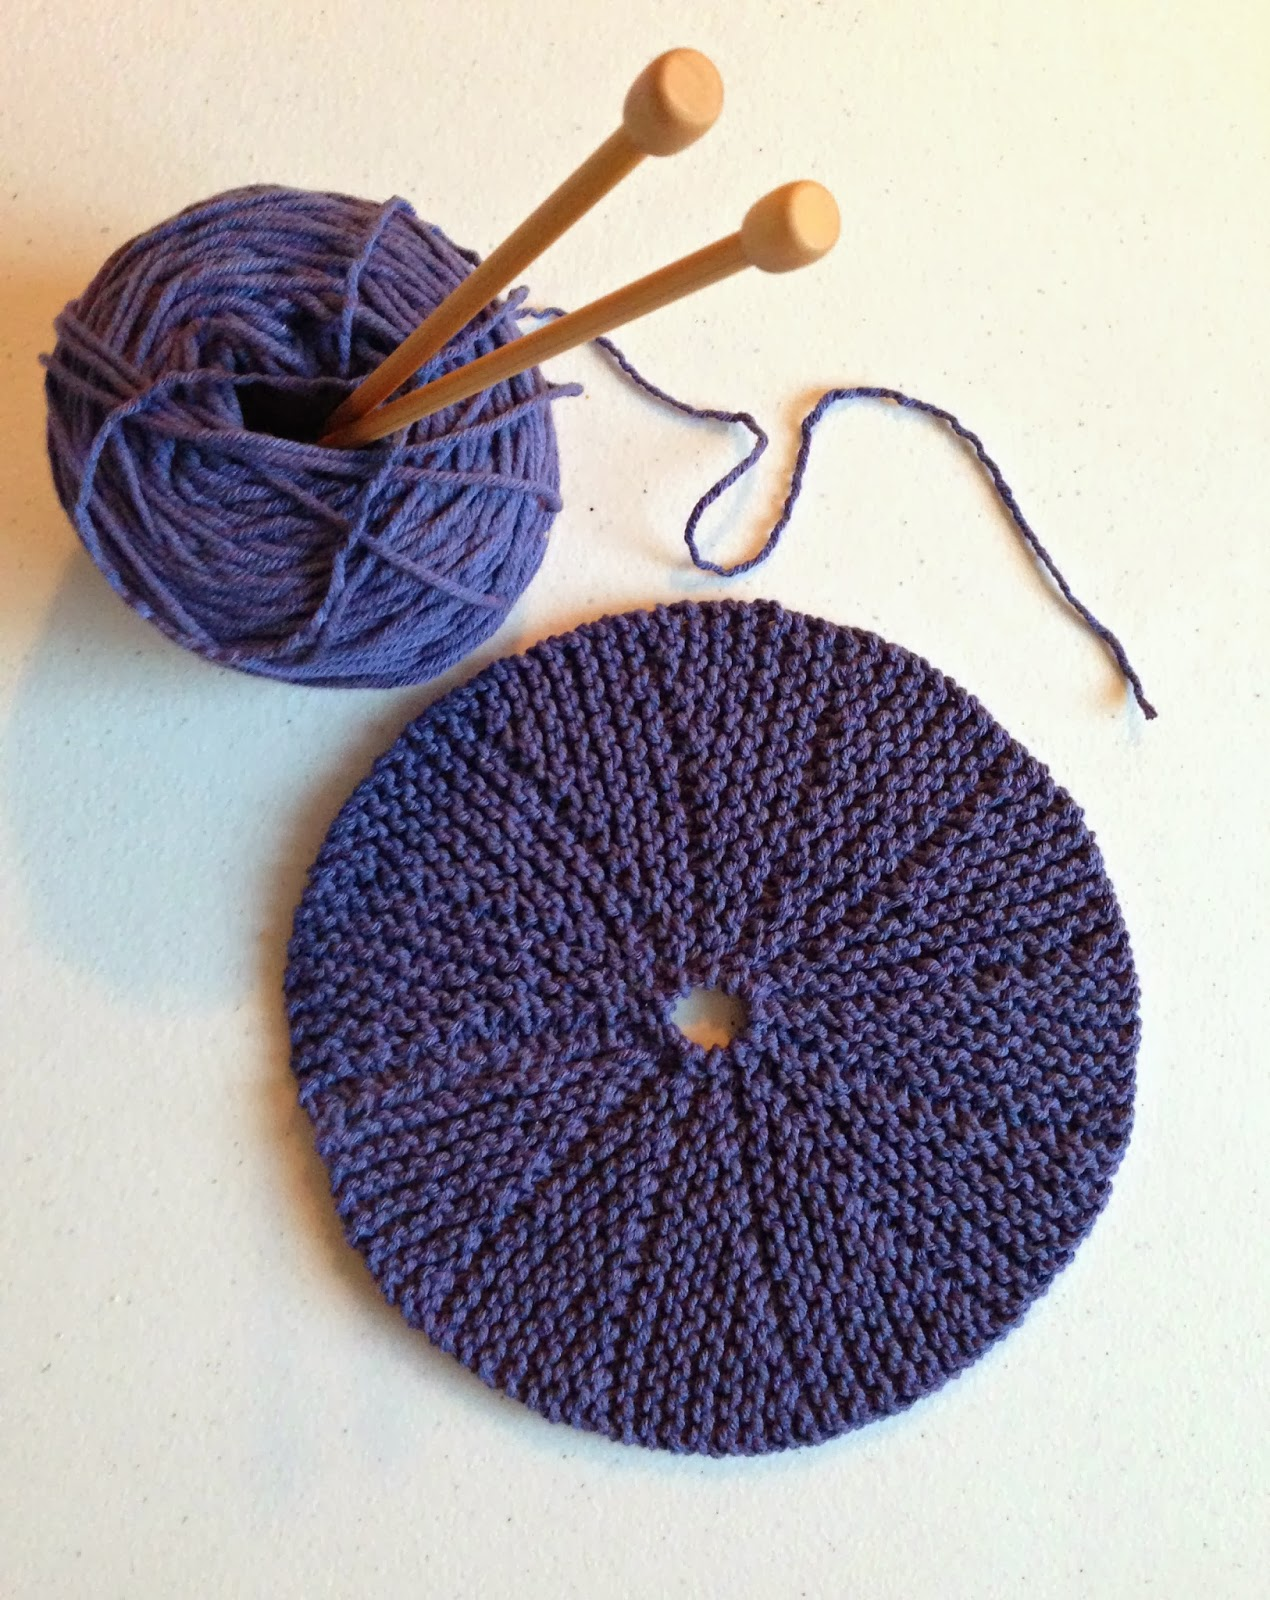 Circular Dishcloth Knitting Patterns Image collections - handicraft ...